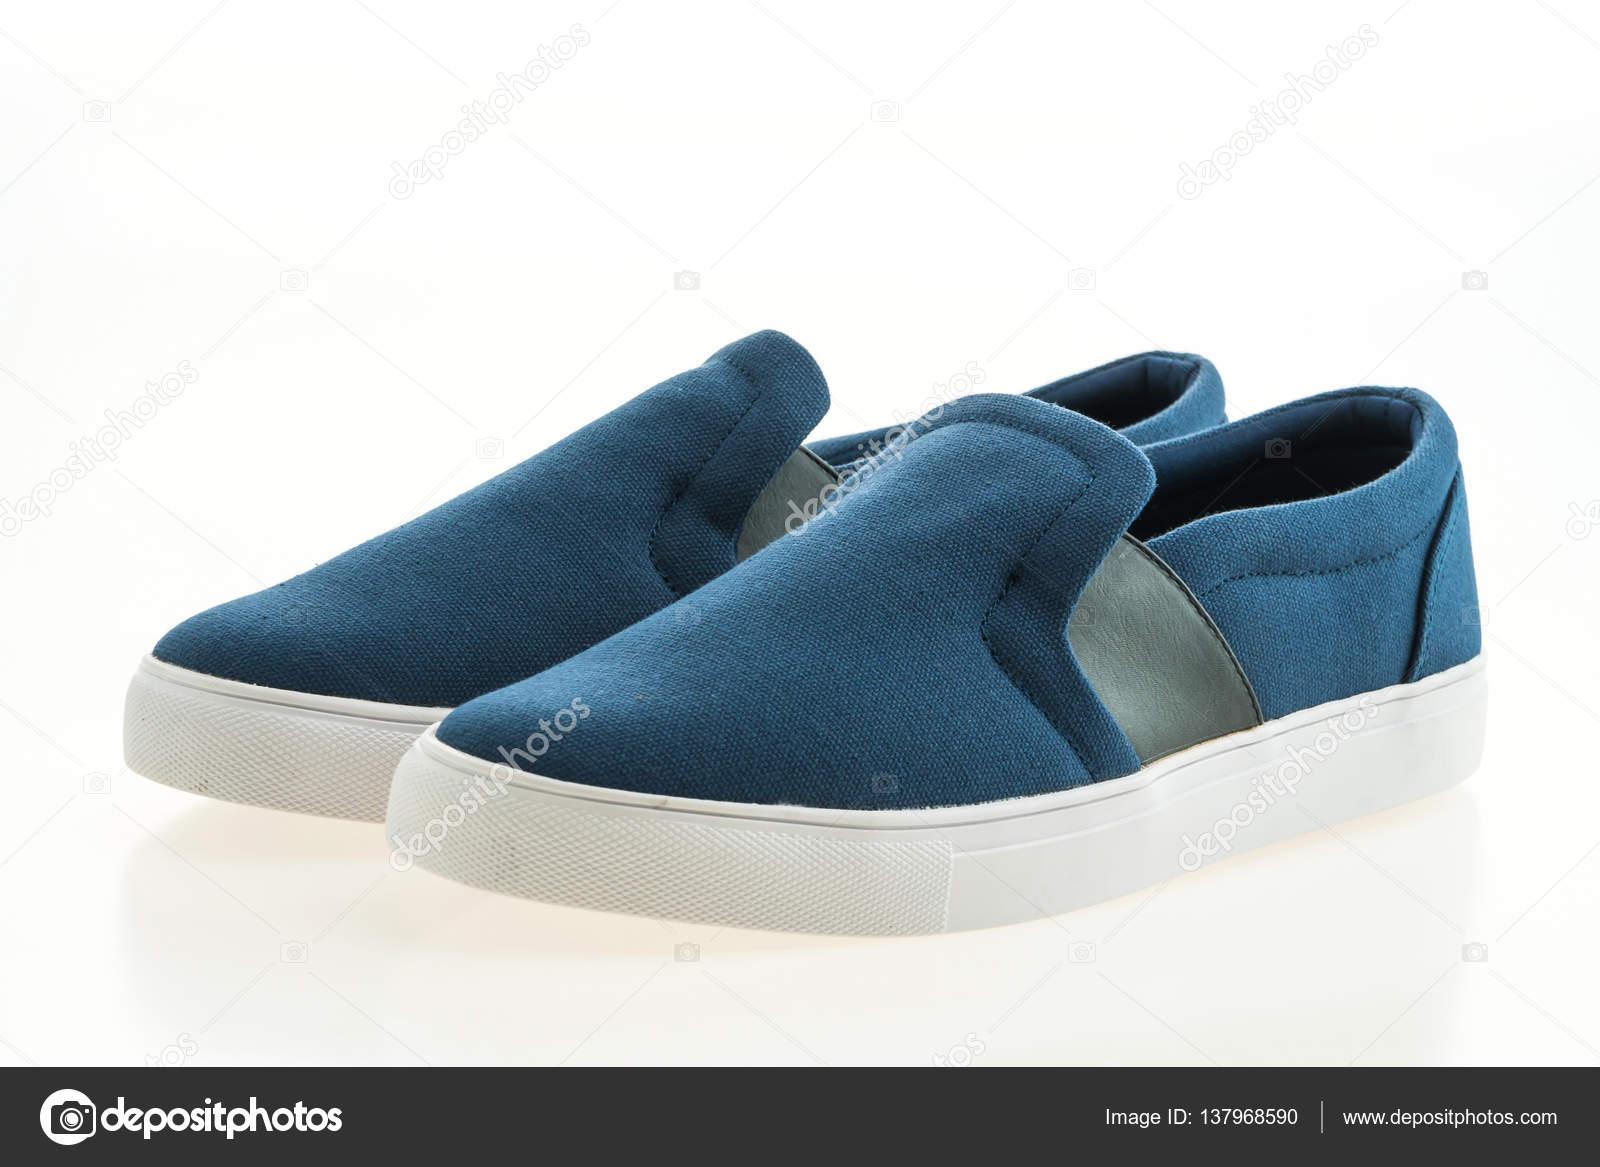 2d4cc4737a4 μόδα παπούτσια άνδρες — Φωτογραφία Αρχείου © mrsiraphol #137968590